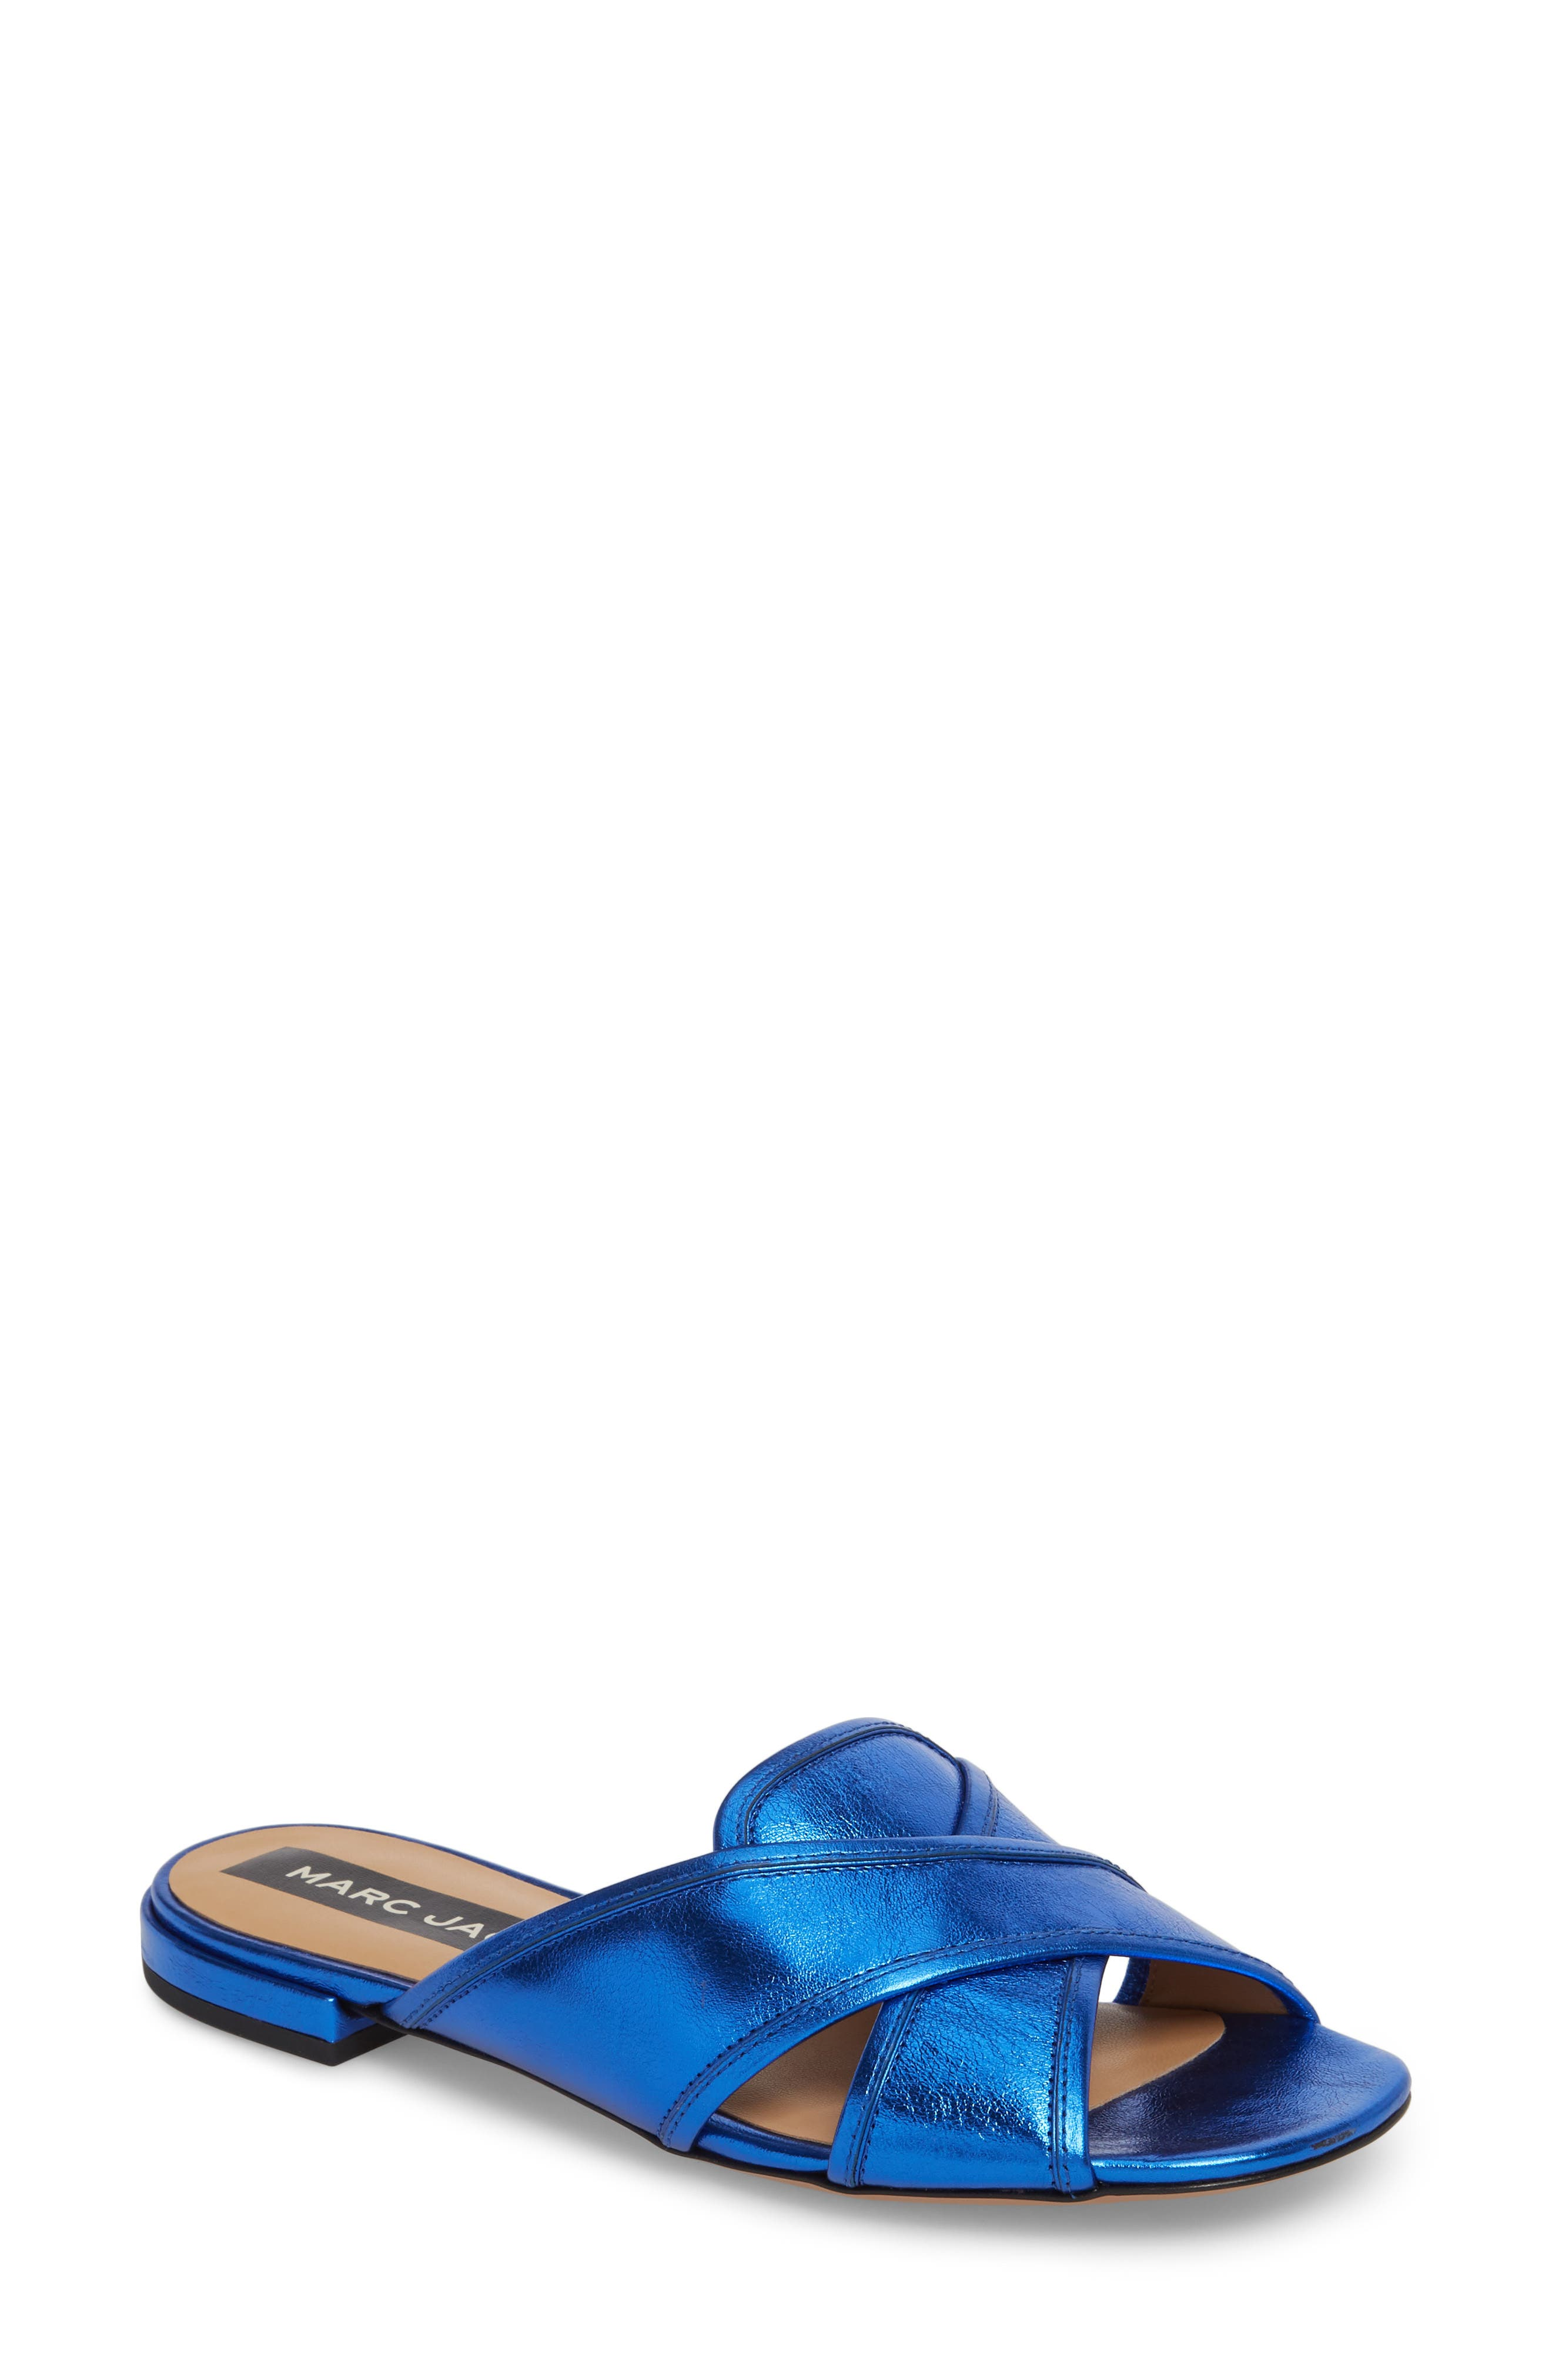 Aurora Metallic Slide Sandal,                         Main,                         color, BLUE